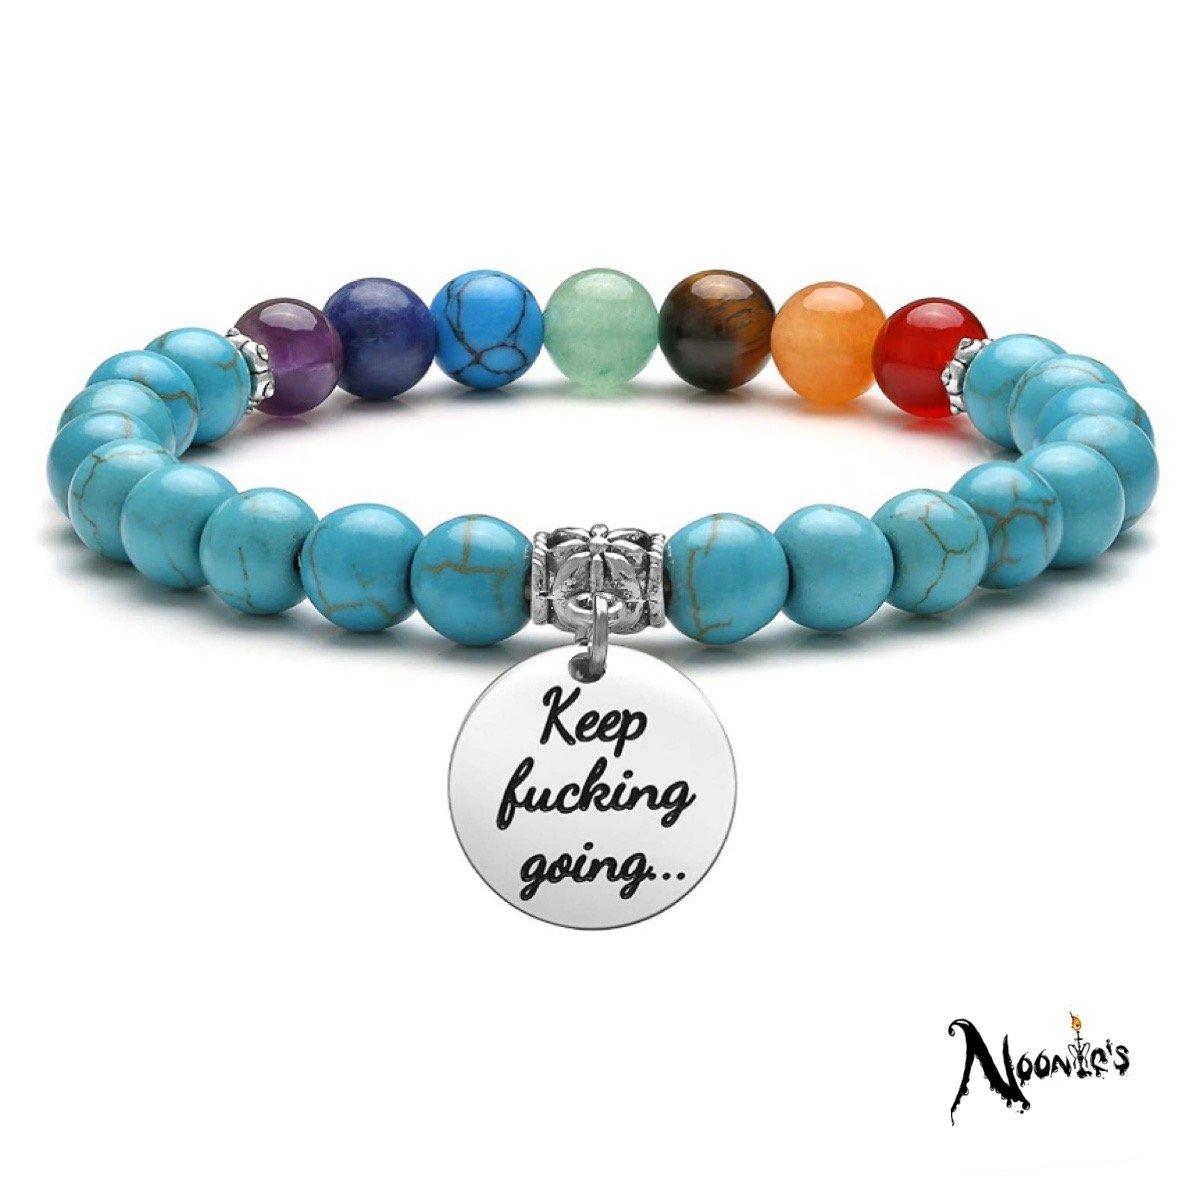 Image of Inspiration bracelet